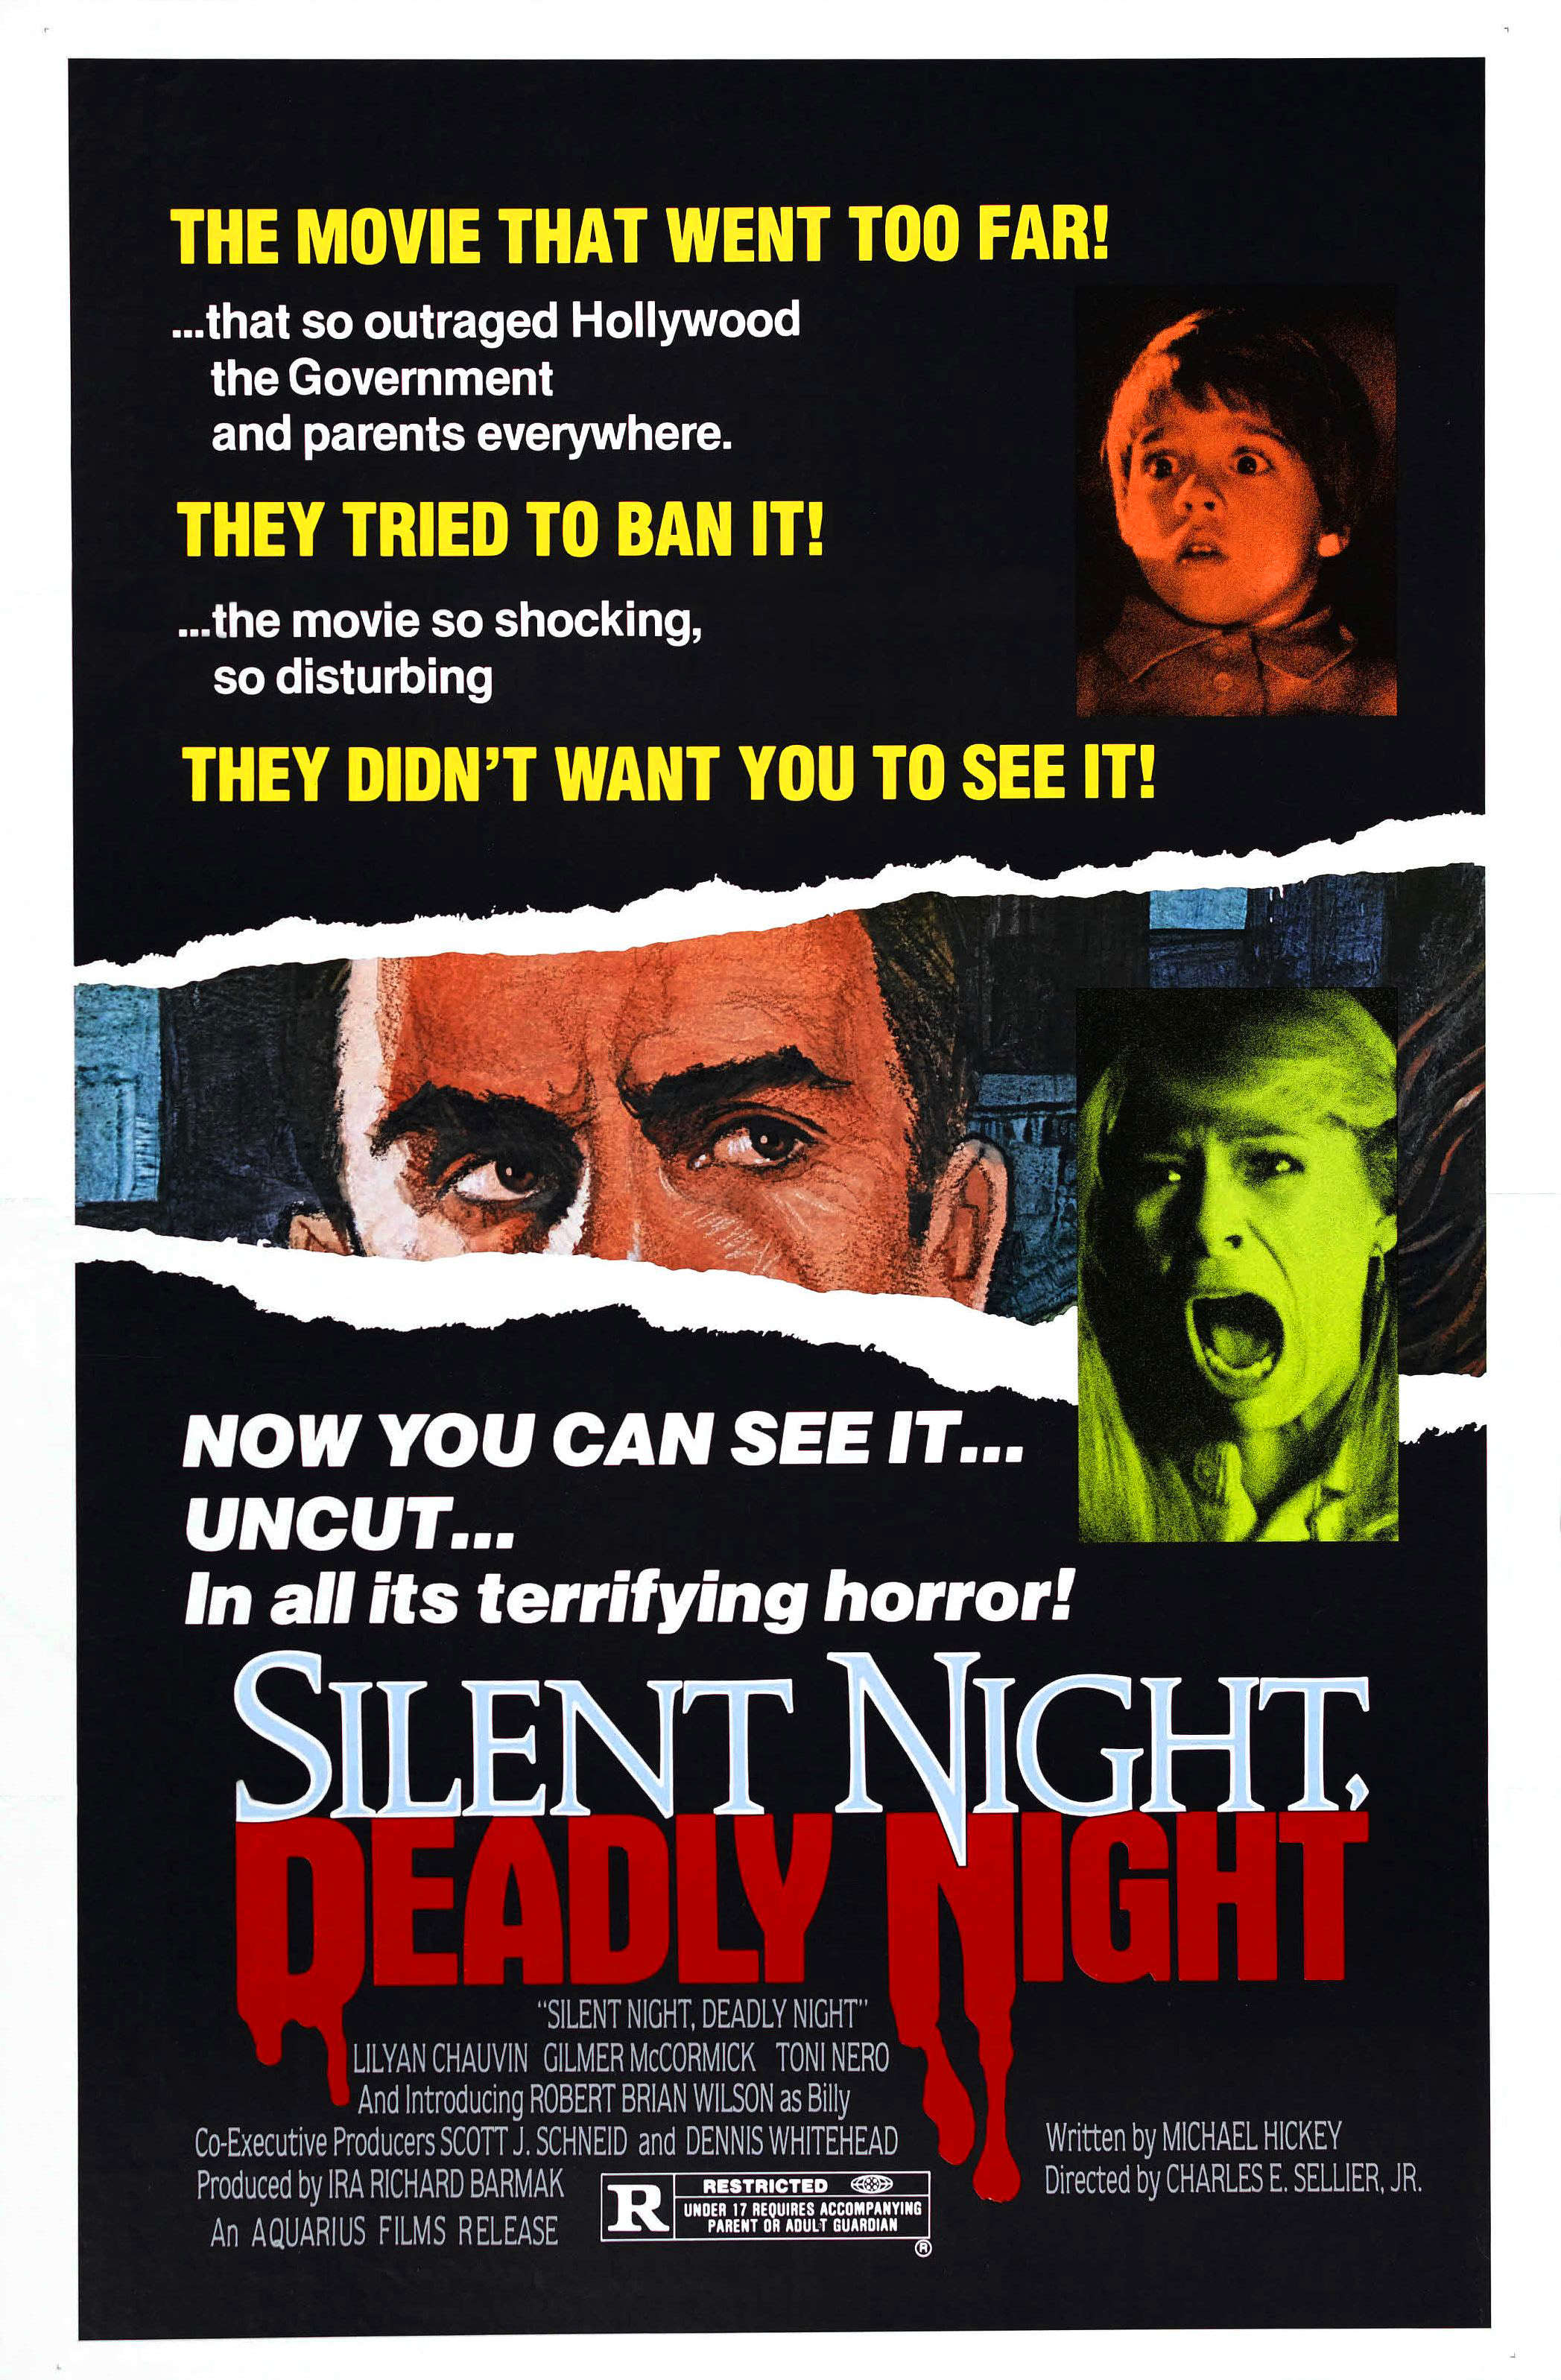 silent_night_deadly_night_poster_01.jpg